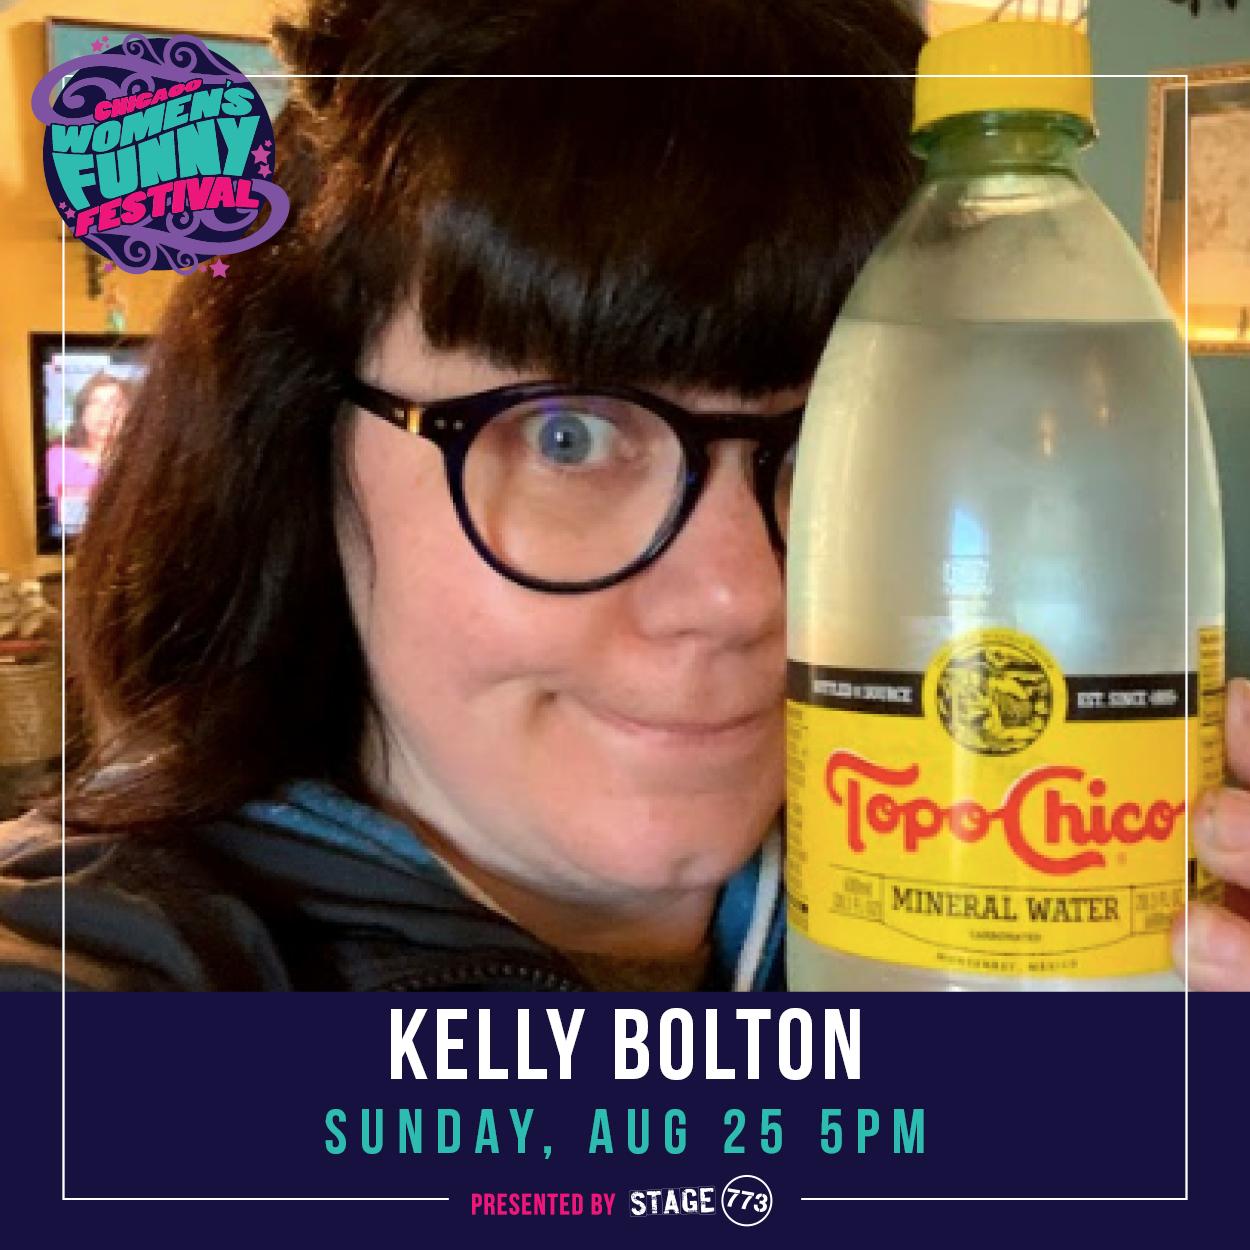 KellyBolton_Sunday_5PM_CWFF2019.jpg